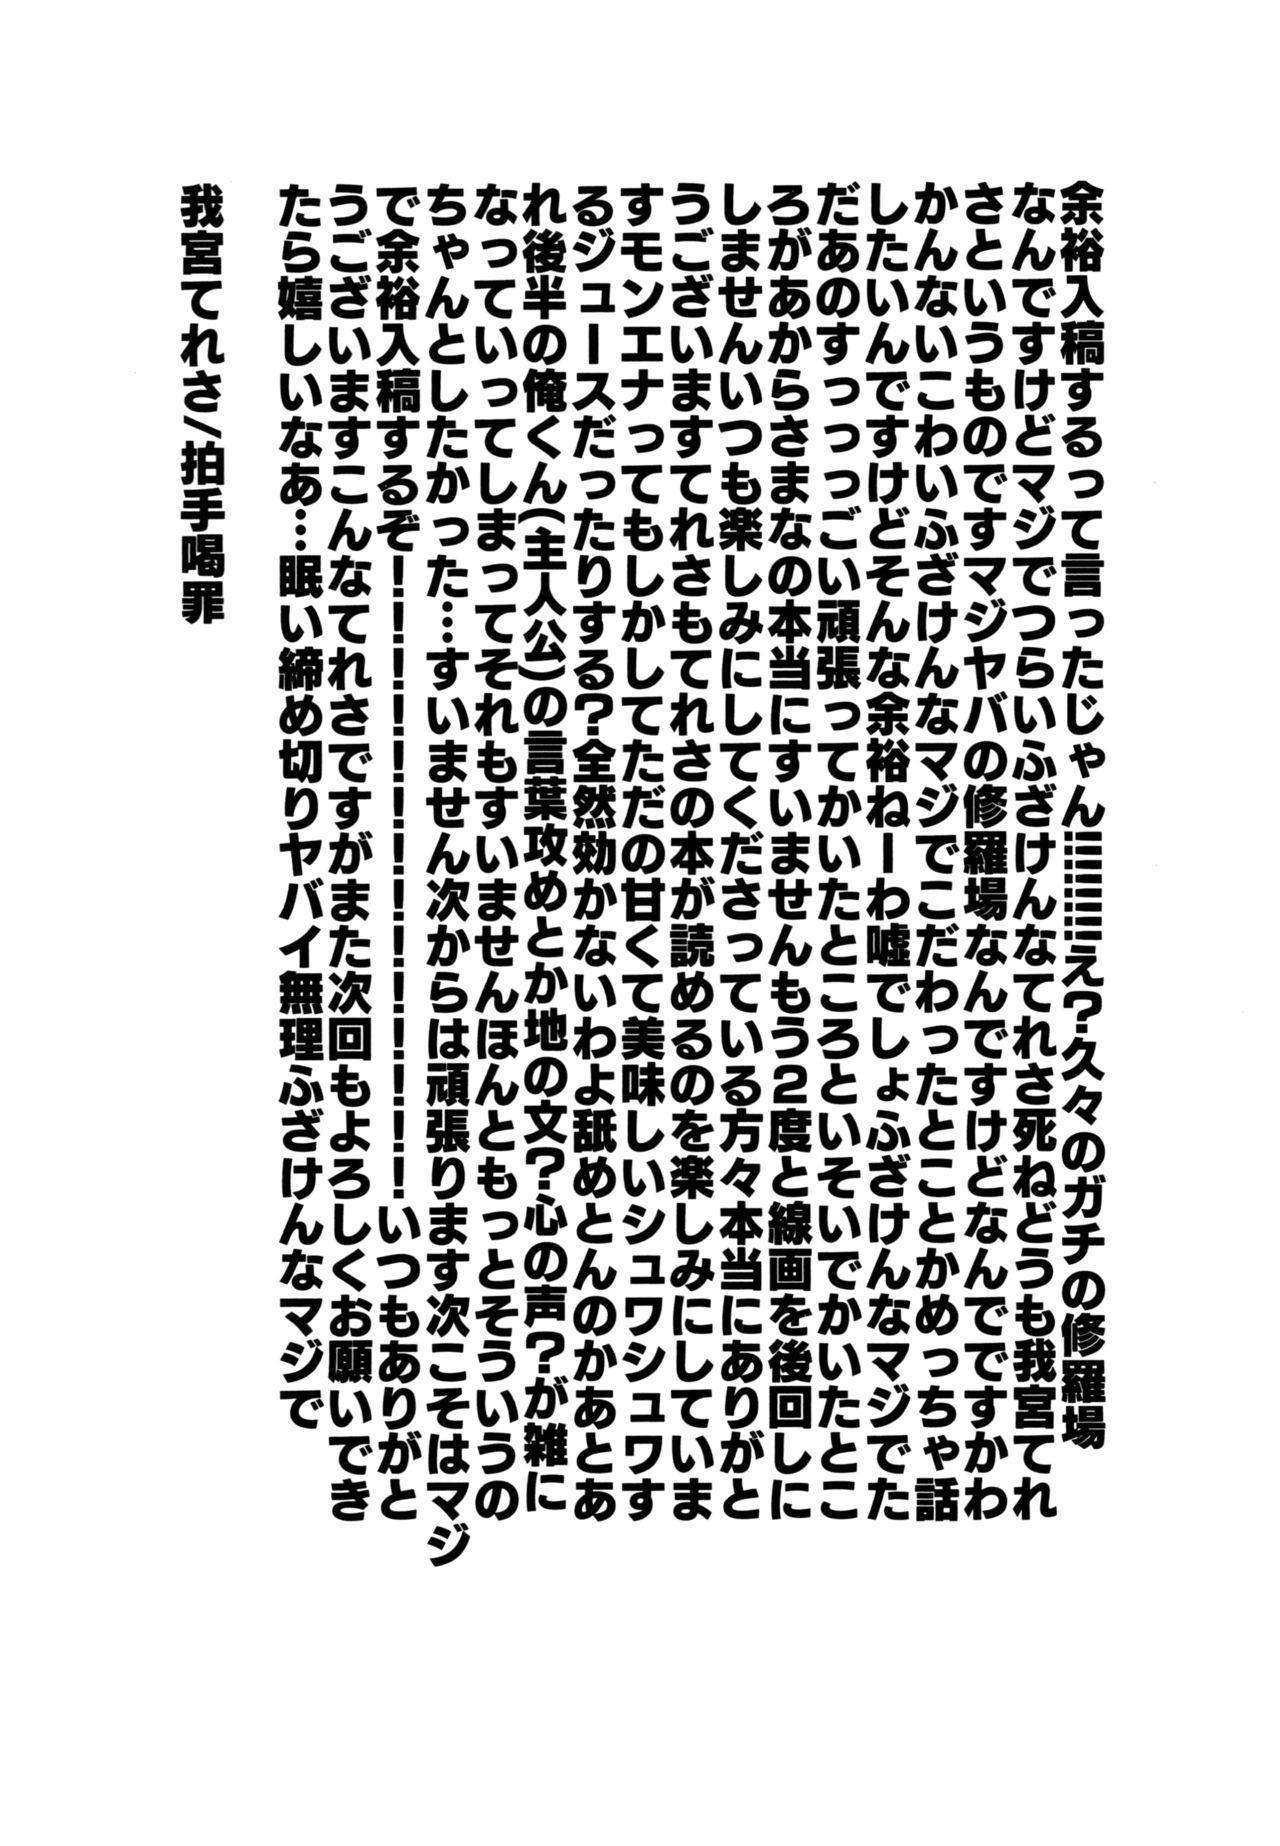 Kurokami Sanpakugan Megane Danshi TS Kyousei Fukujuu Fuck 27